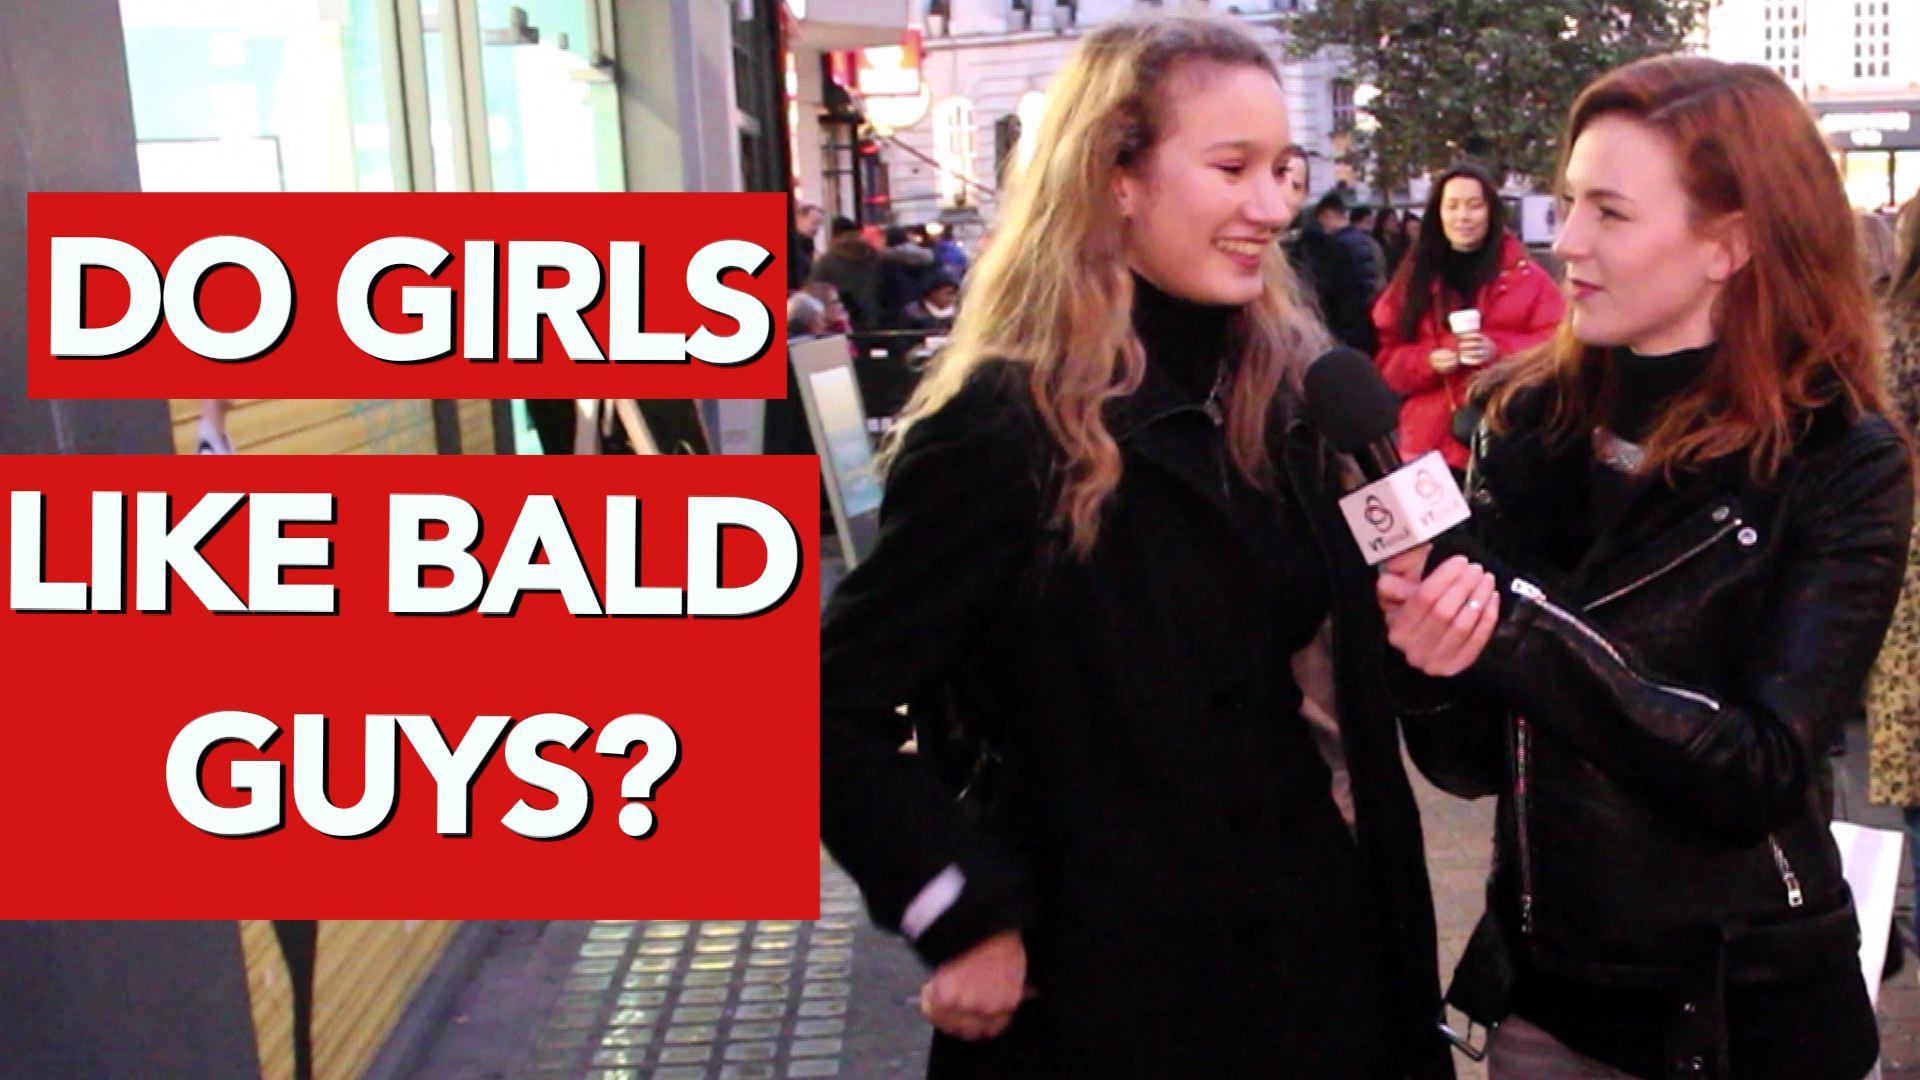 Do Girls Like Bald Guys